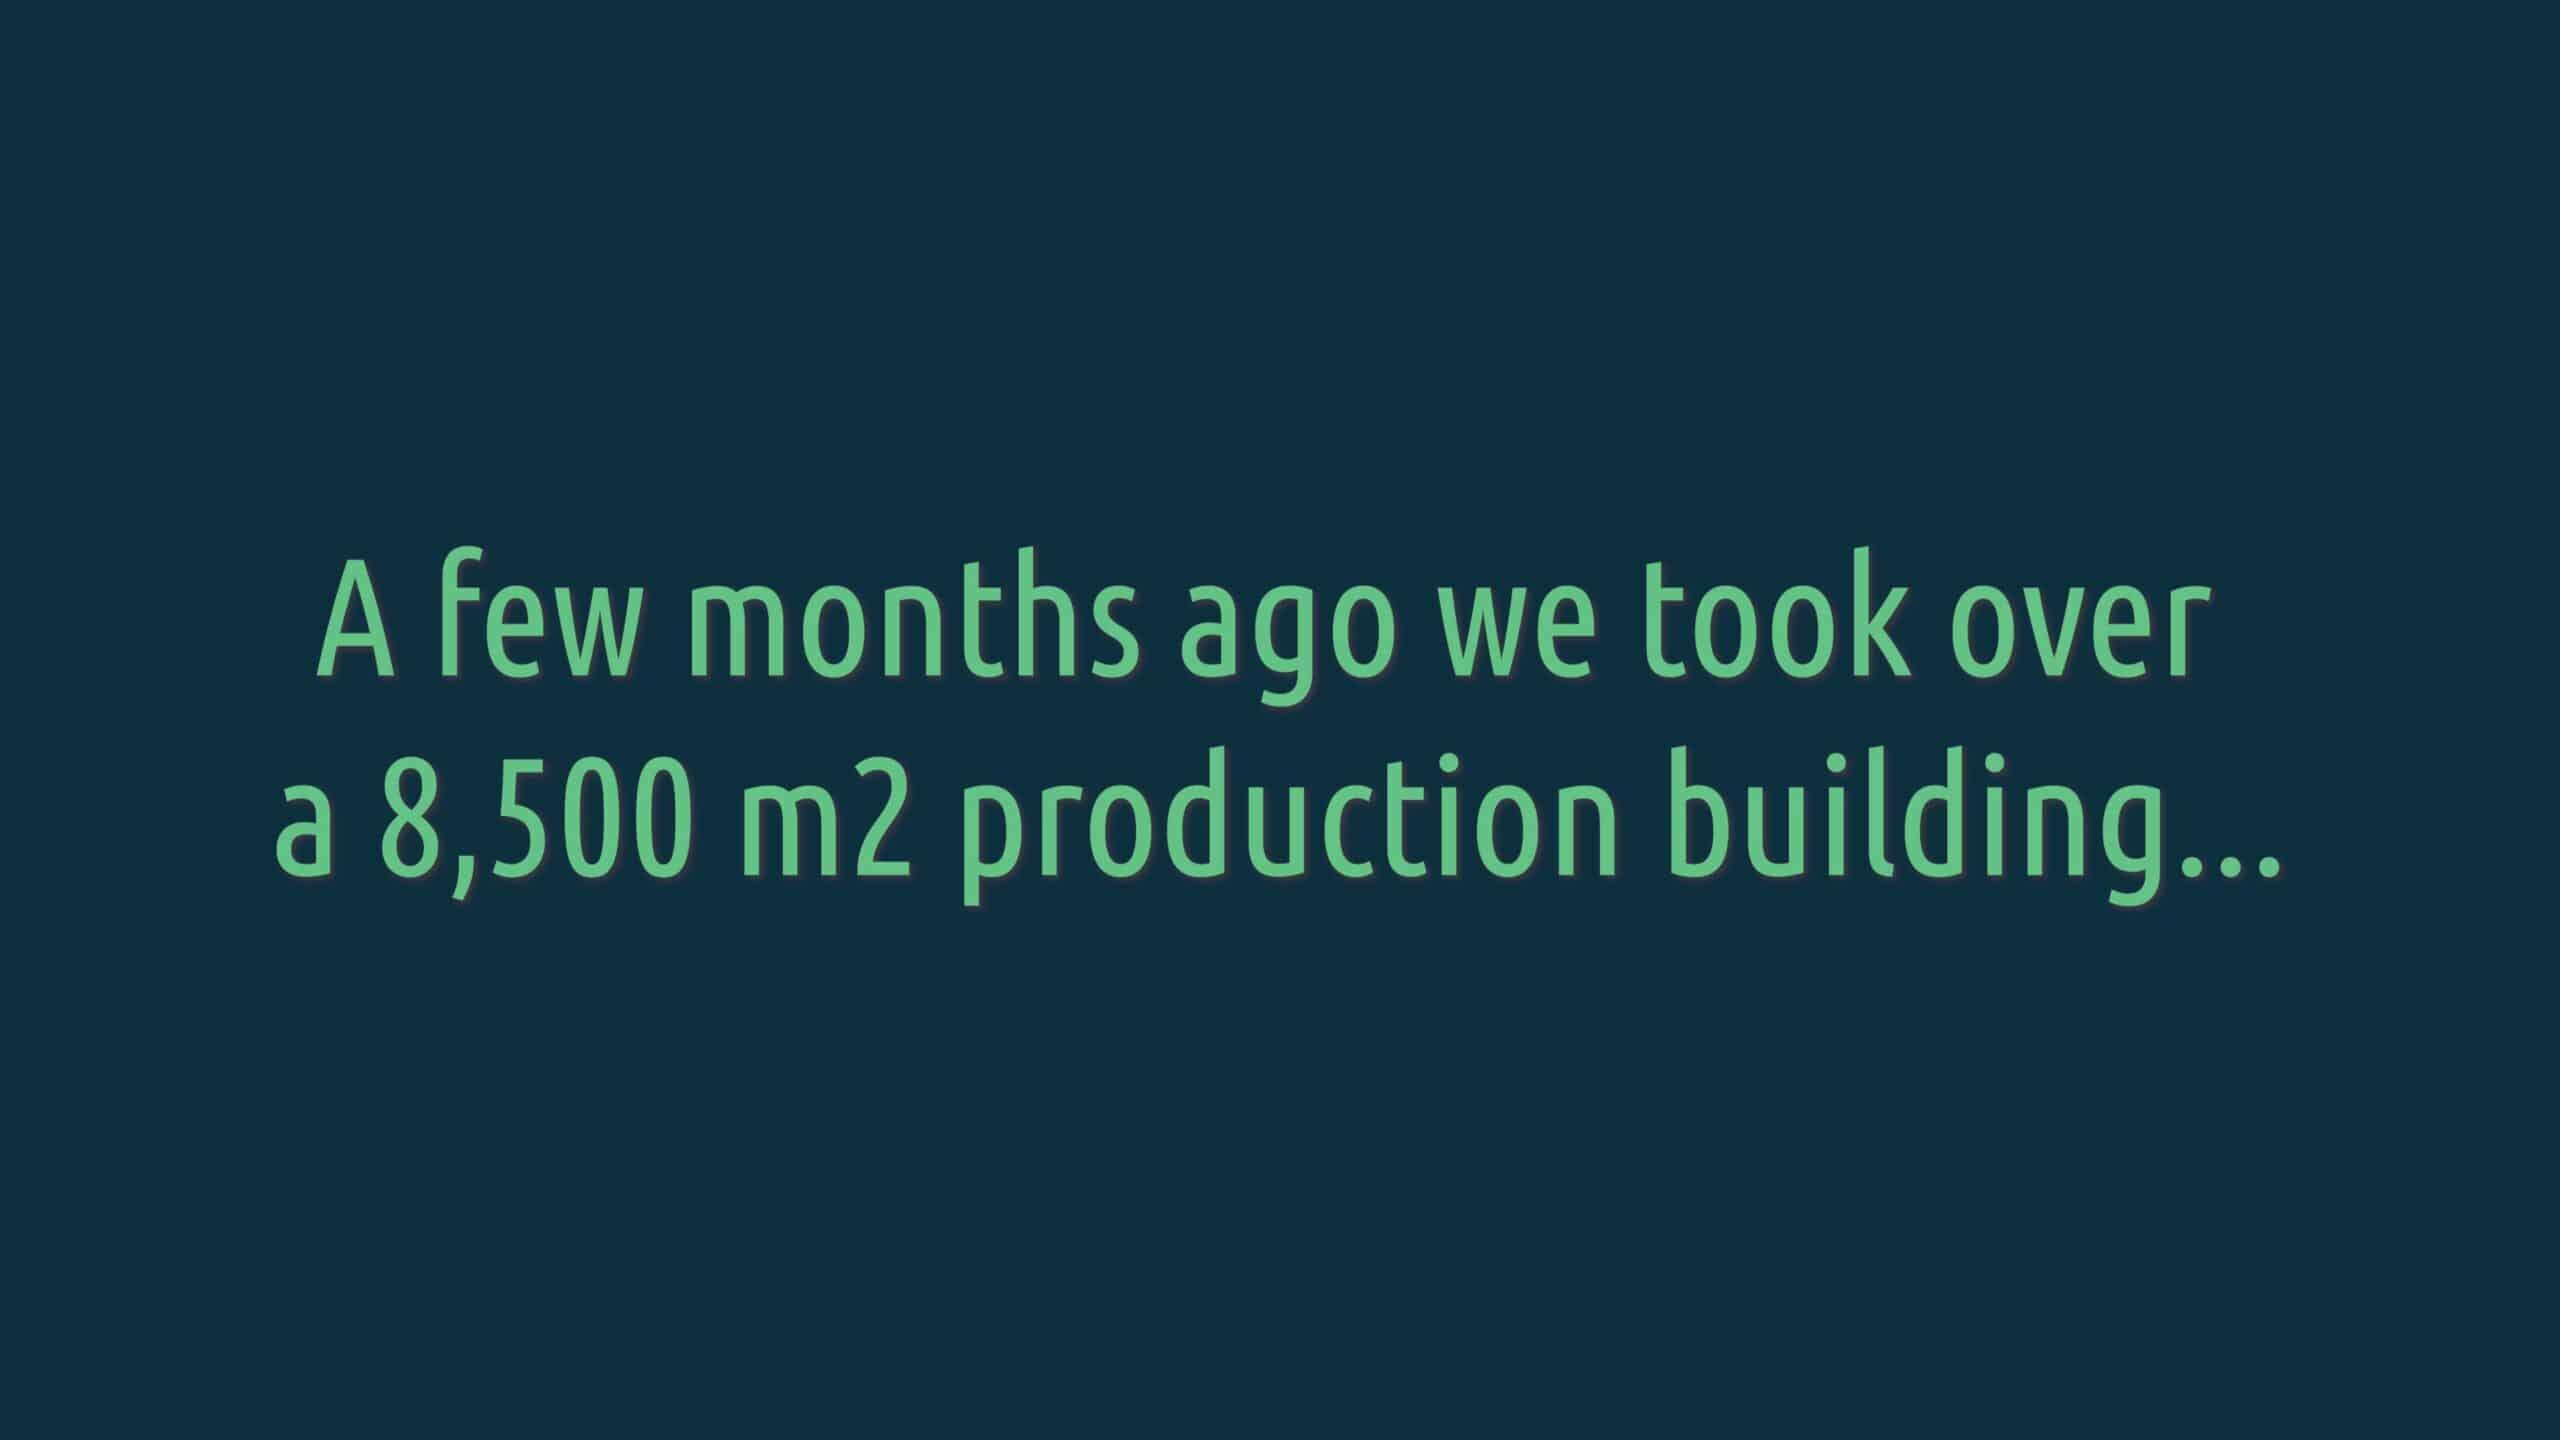 Blue World production building